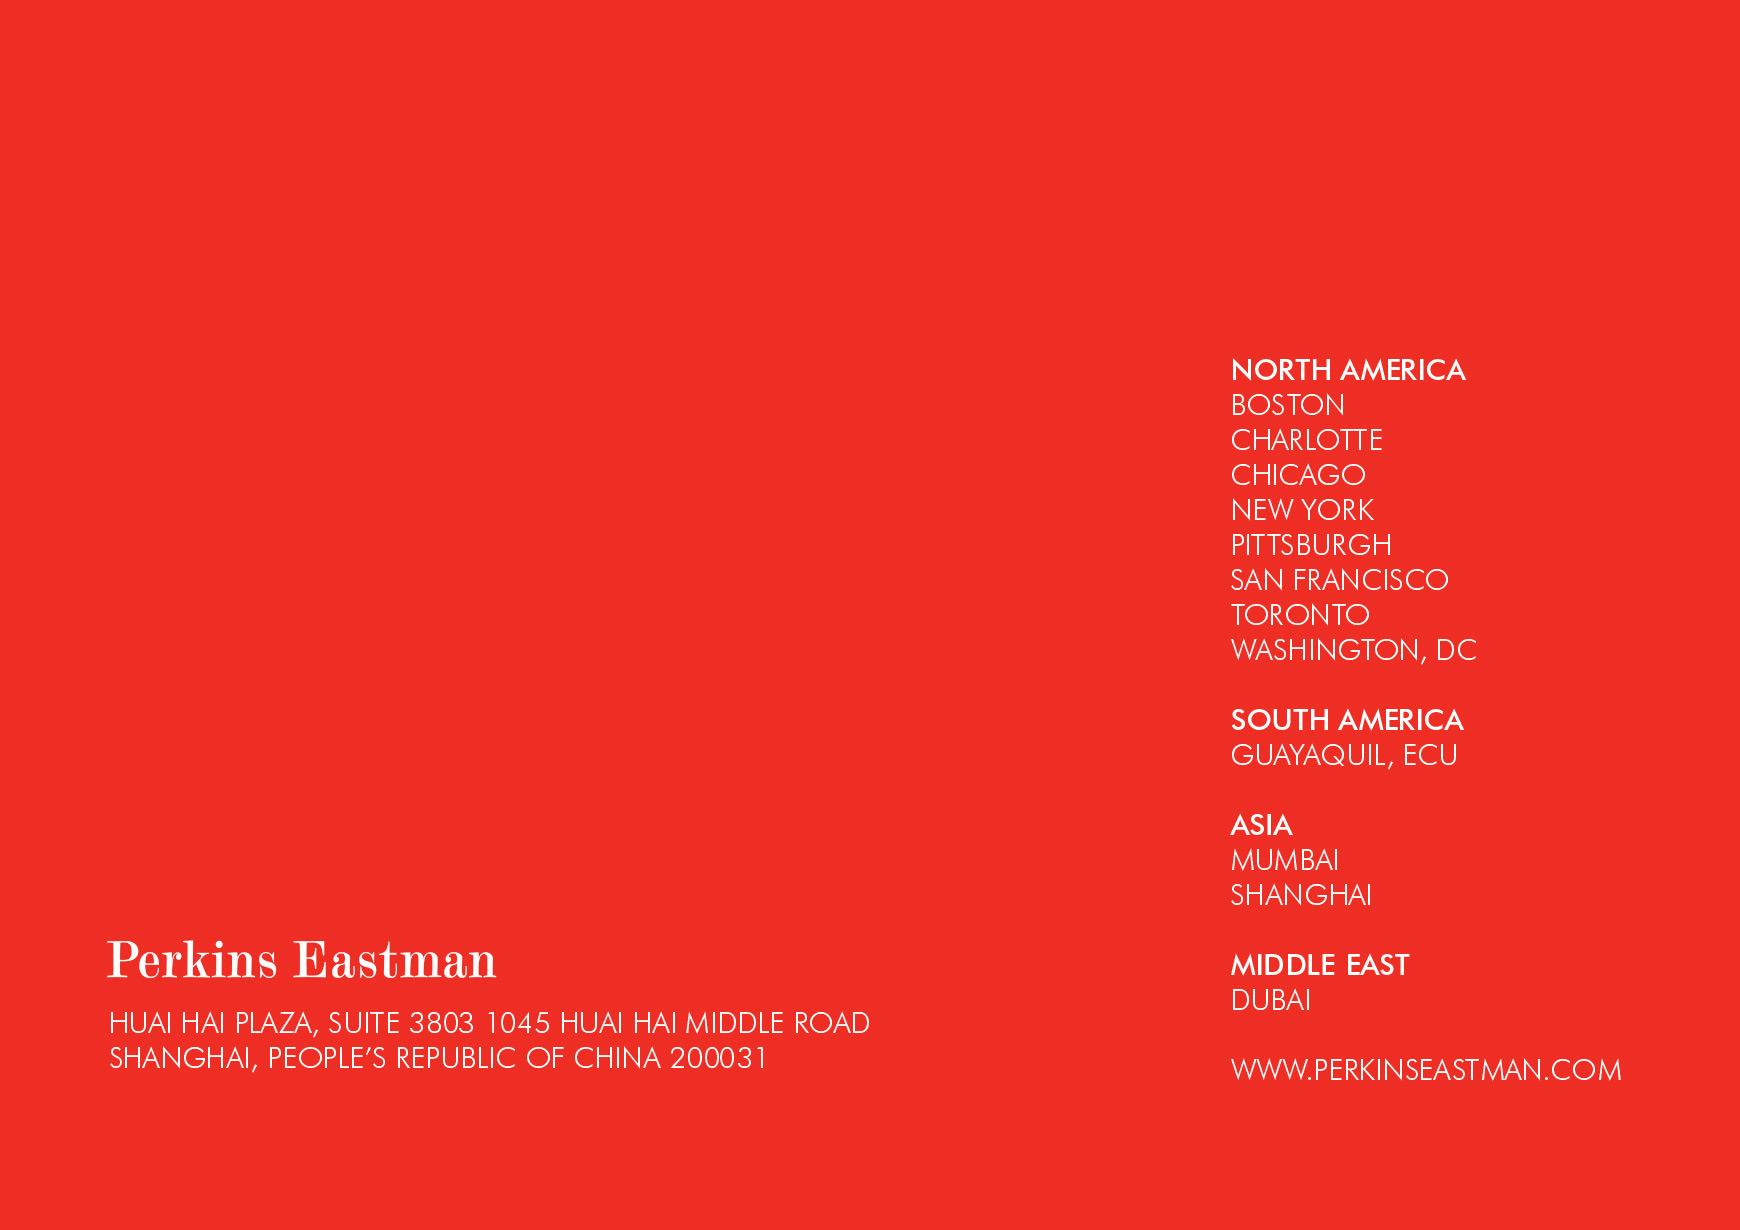 LUNAR NEW YEAR CARD 2014 | PERKINS EASTMAN ARCHITECTS ·